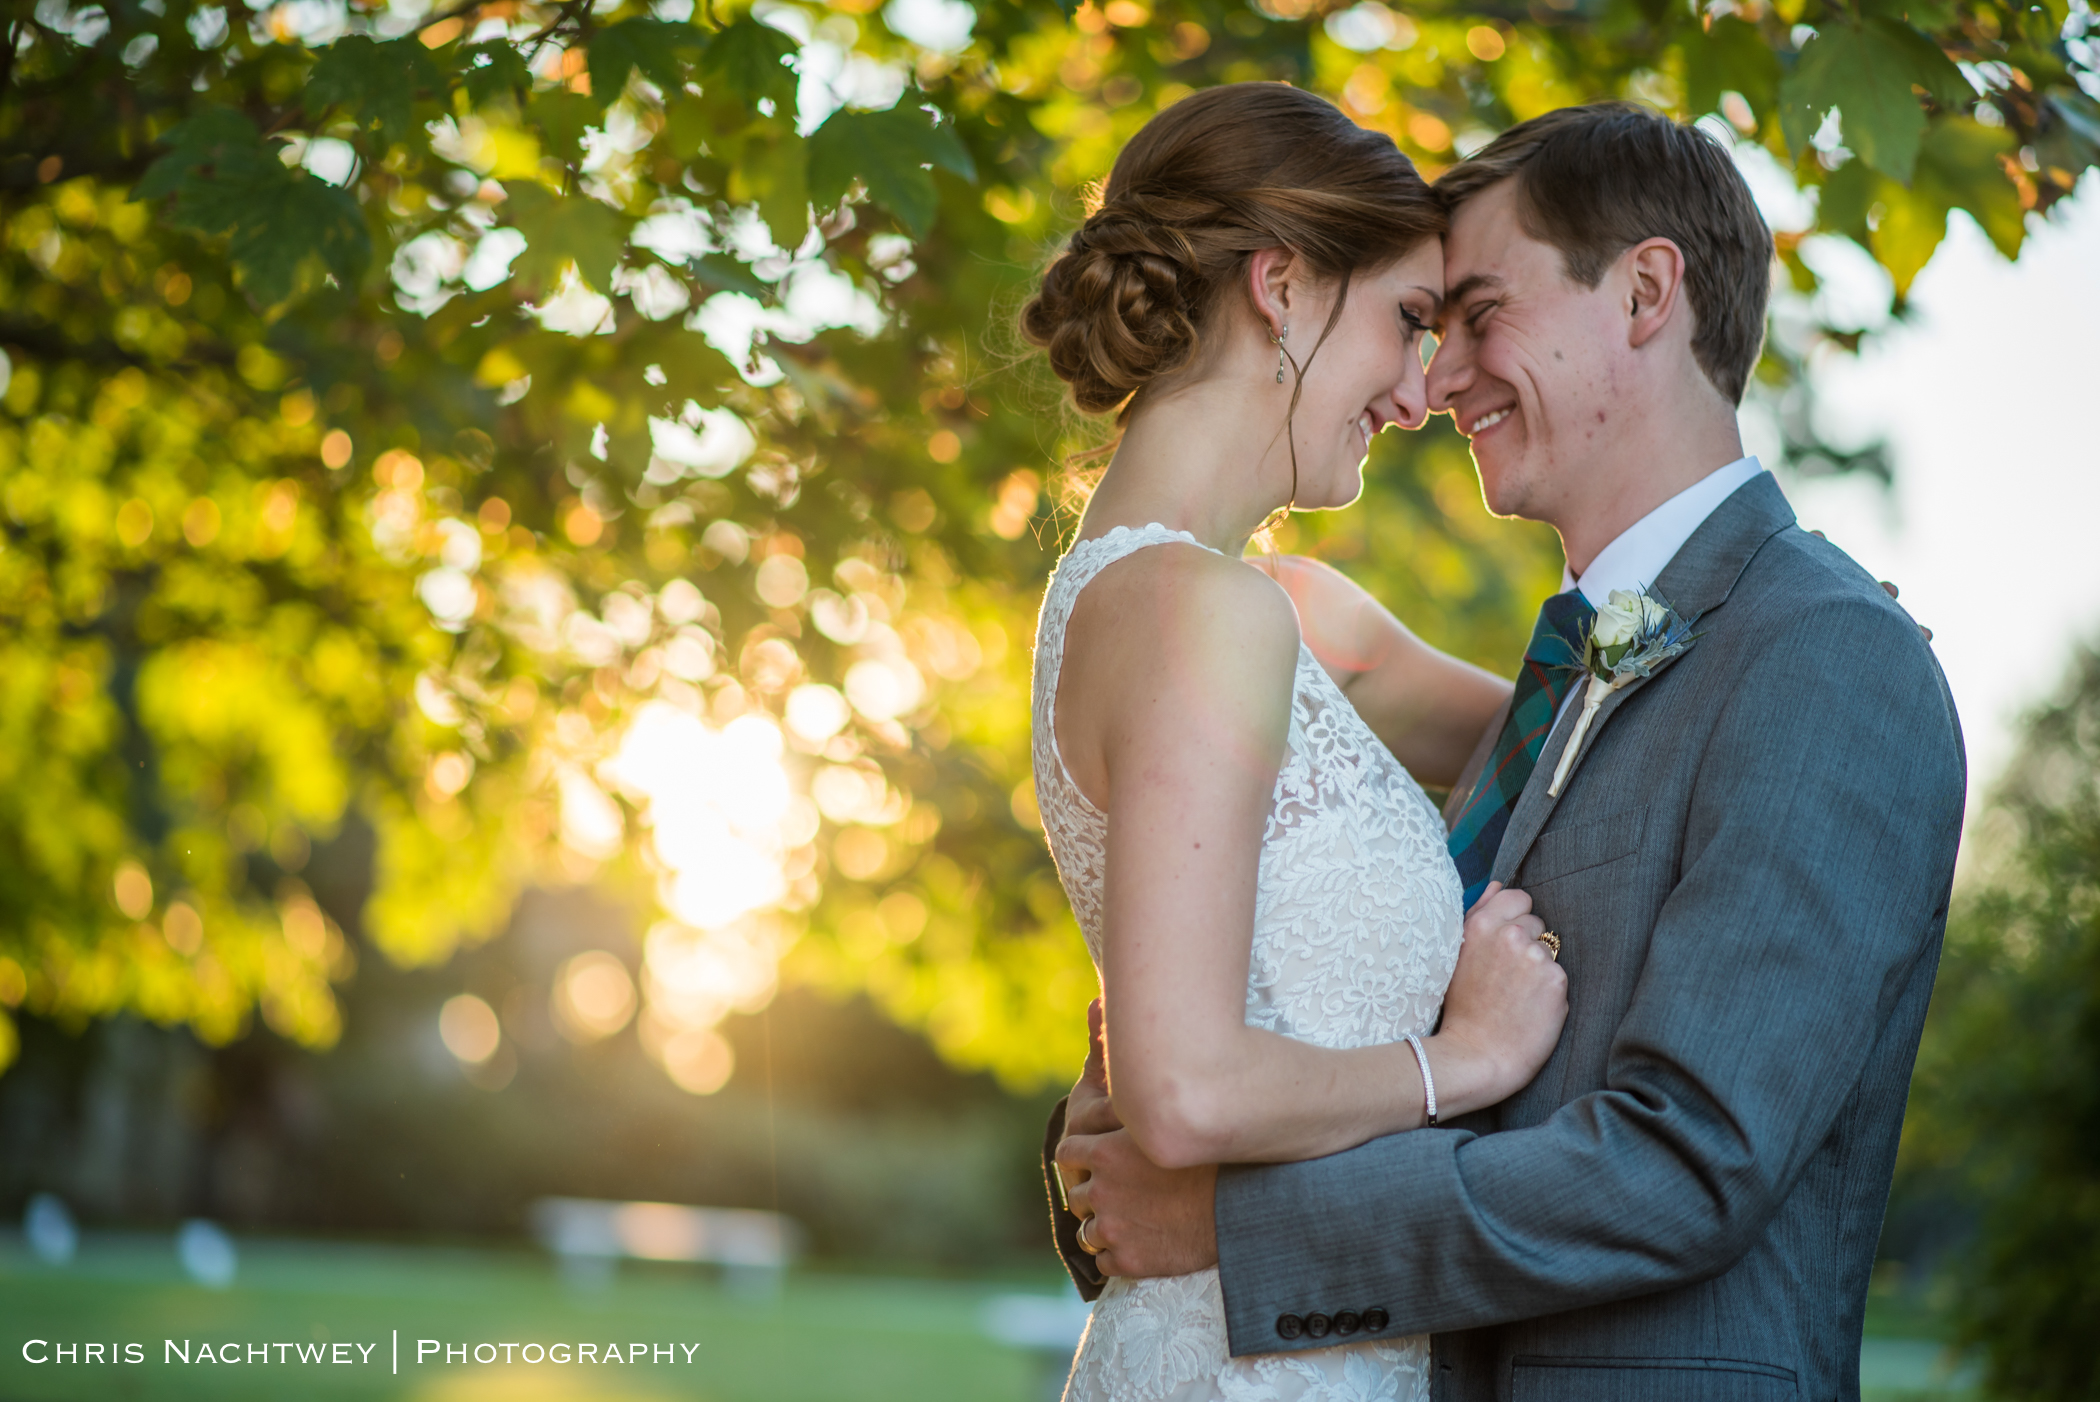 harkness-wedding-photos-chris-nachtwey-photography-2018-32.jpg